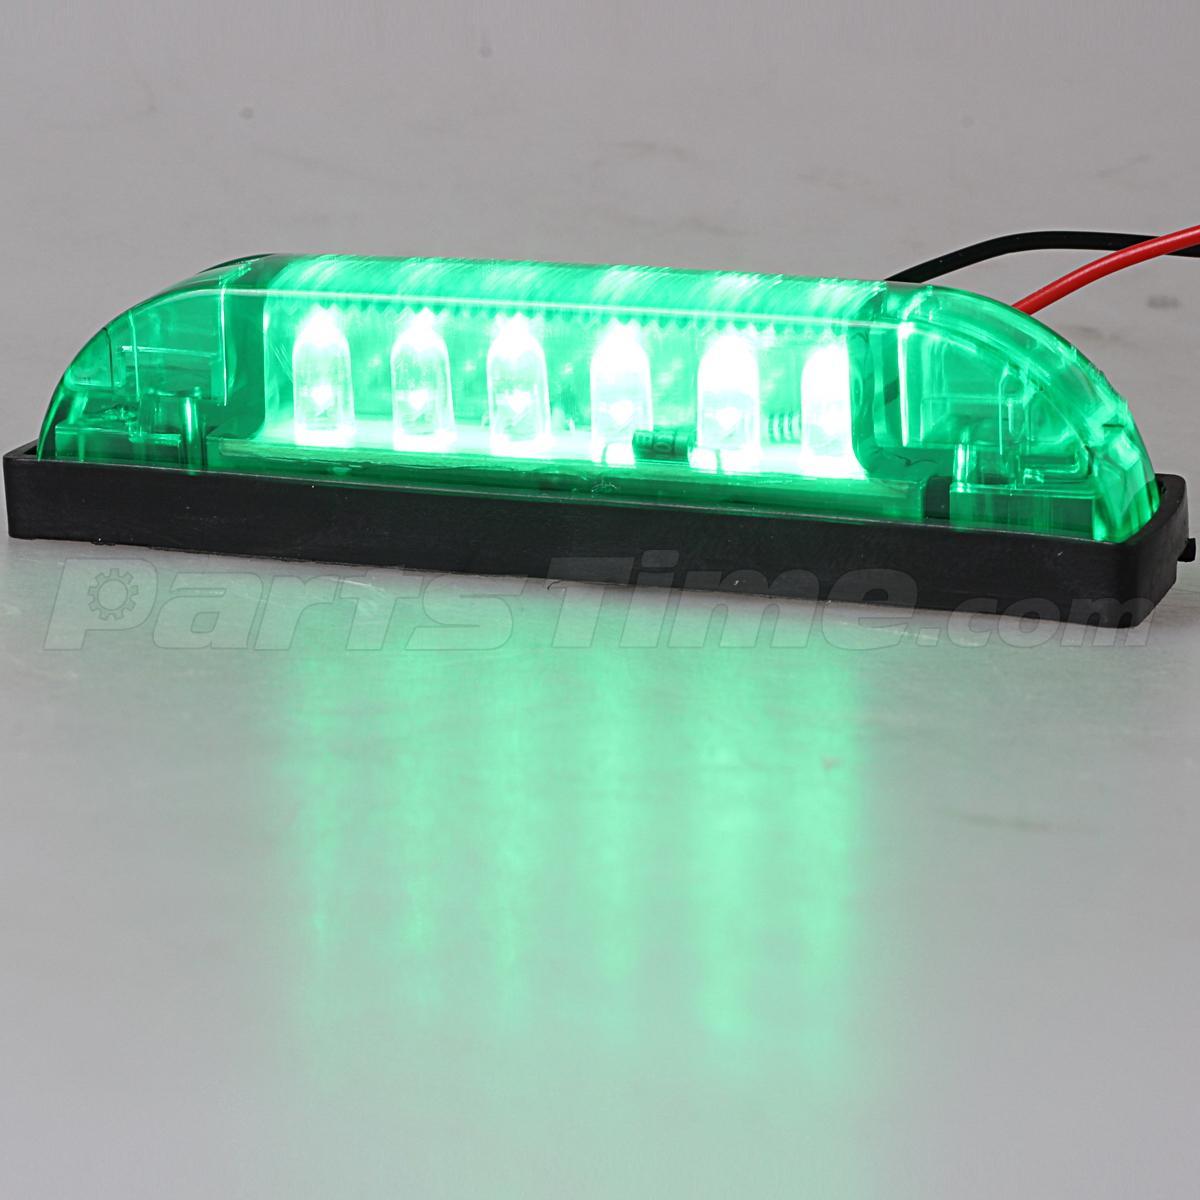 "Green Led Strip Light: 4"" Green Waterproof LED Light Bar 6 LEDs Utility Strip"